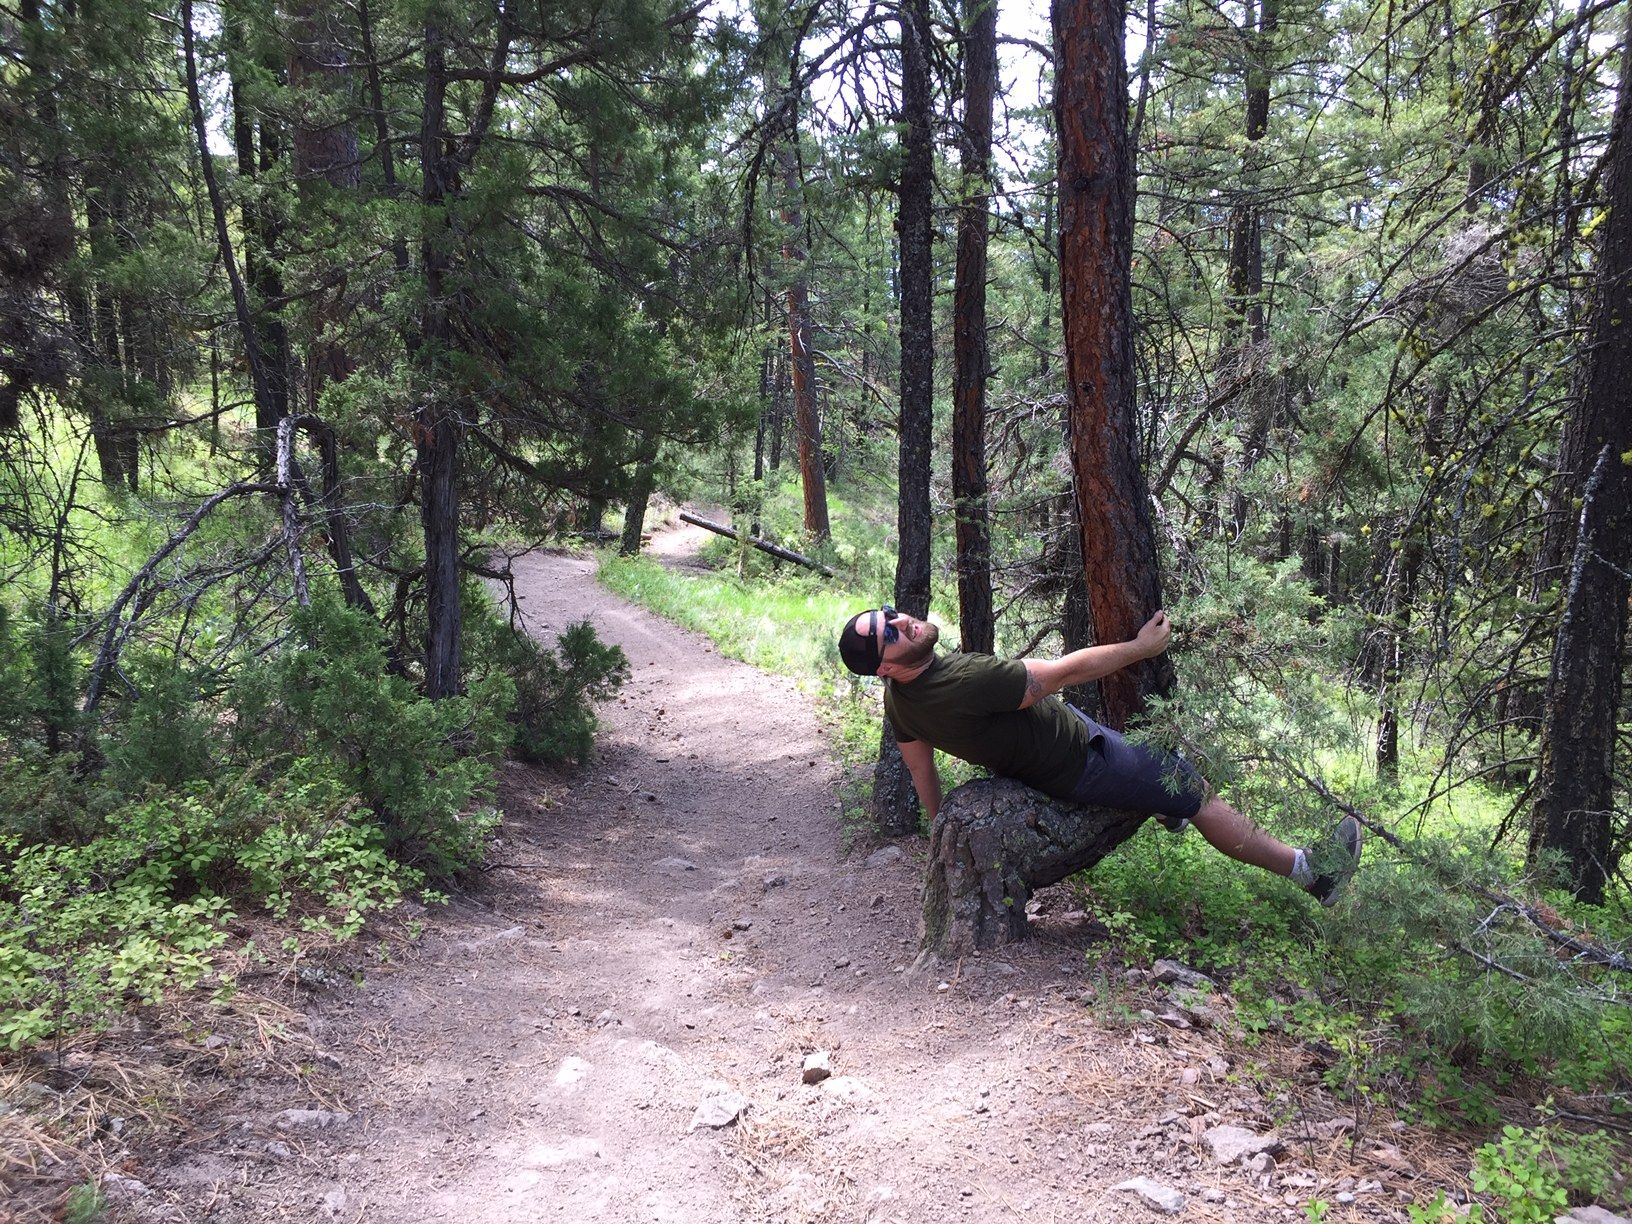 McDougall Rim Trail, West Kelowna, British Columbia,